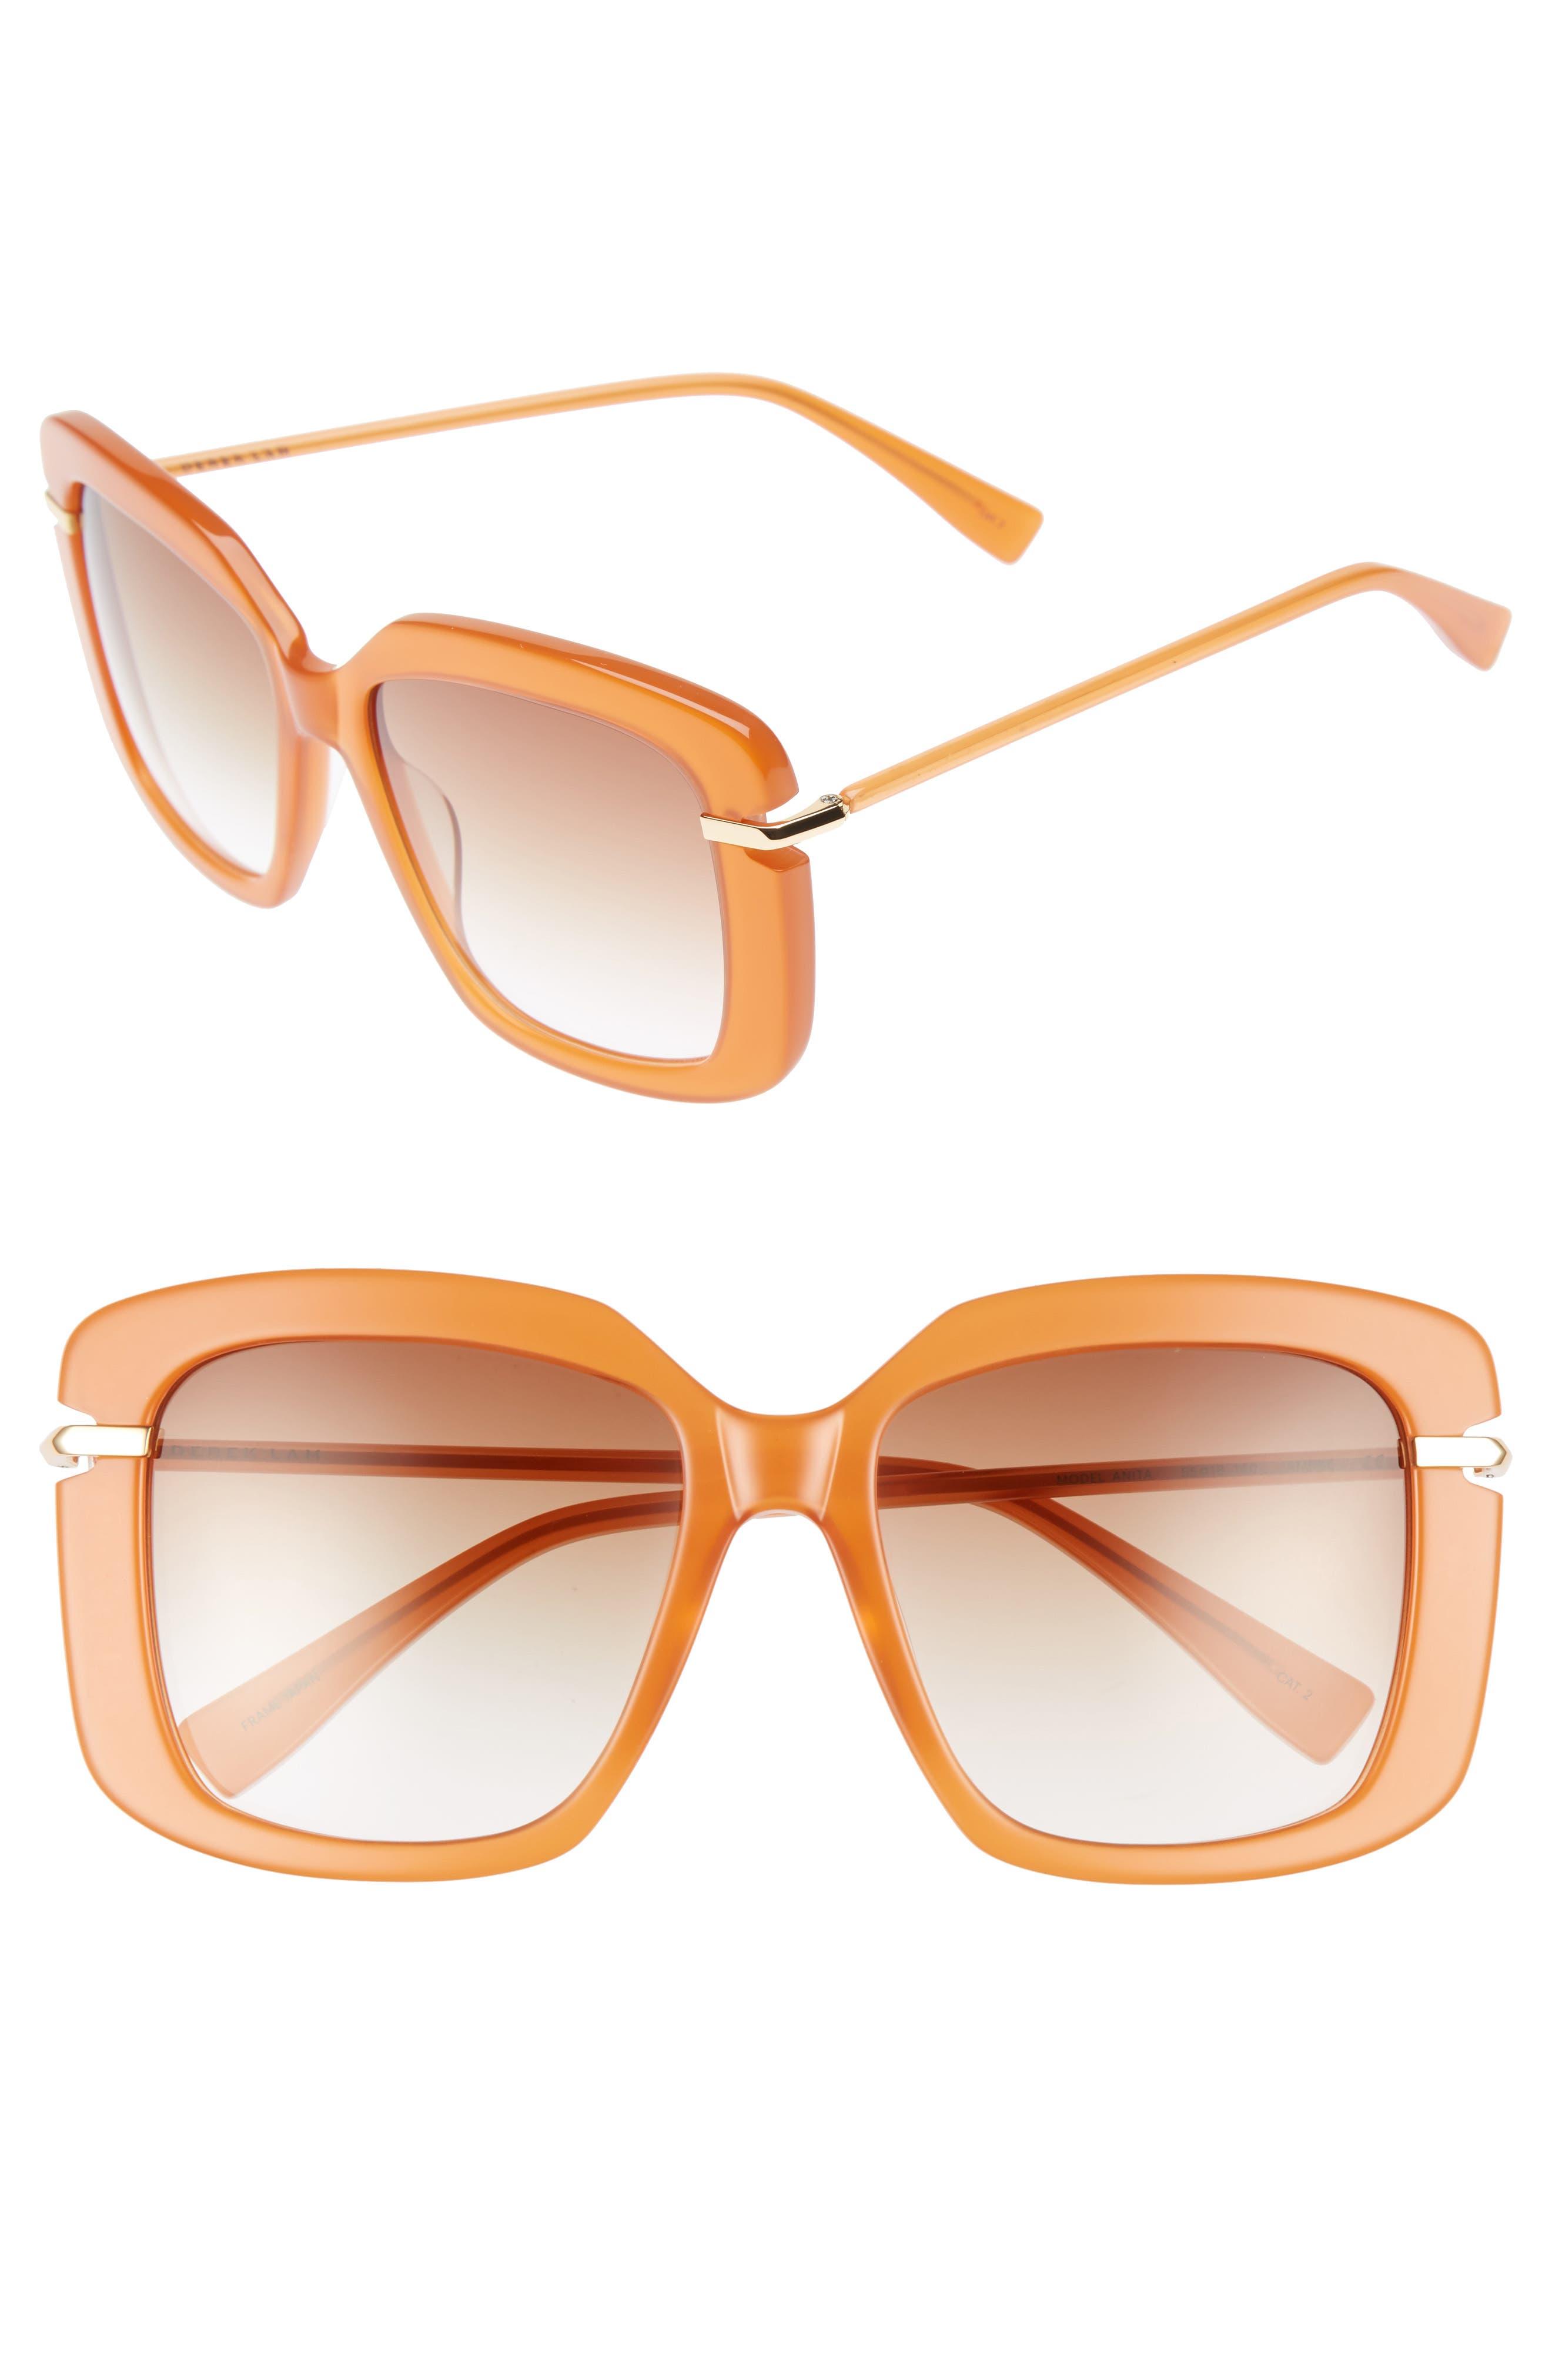 Anita 55mm Square Sunglasses,                             Main thumbnail 1, color,                             AMBER